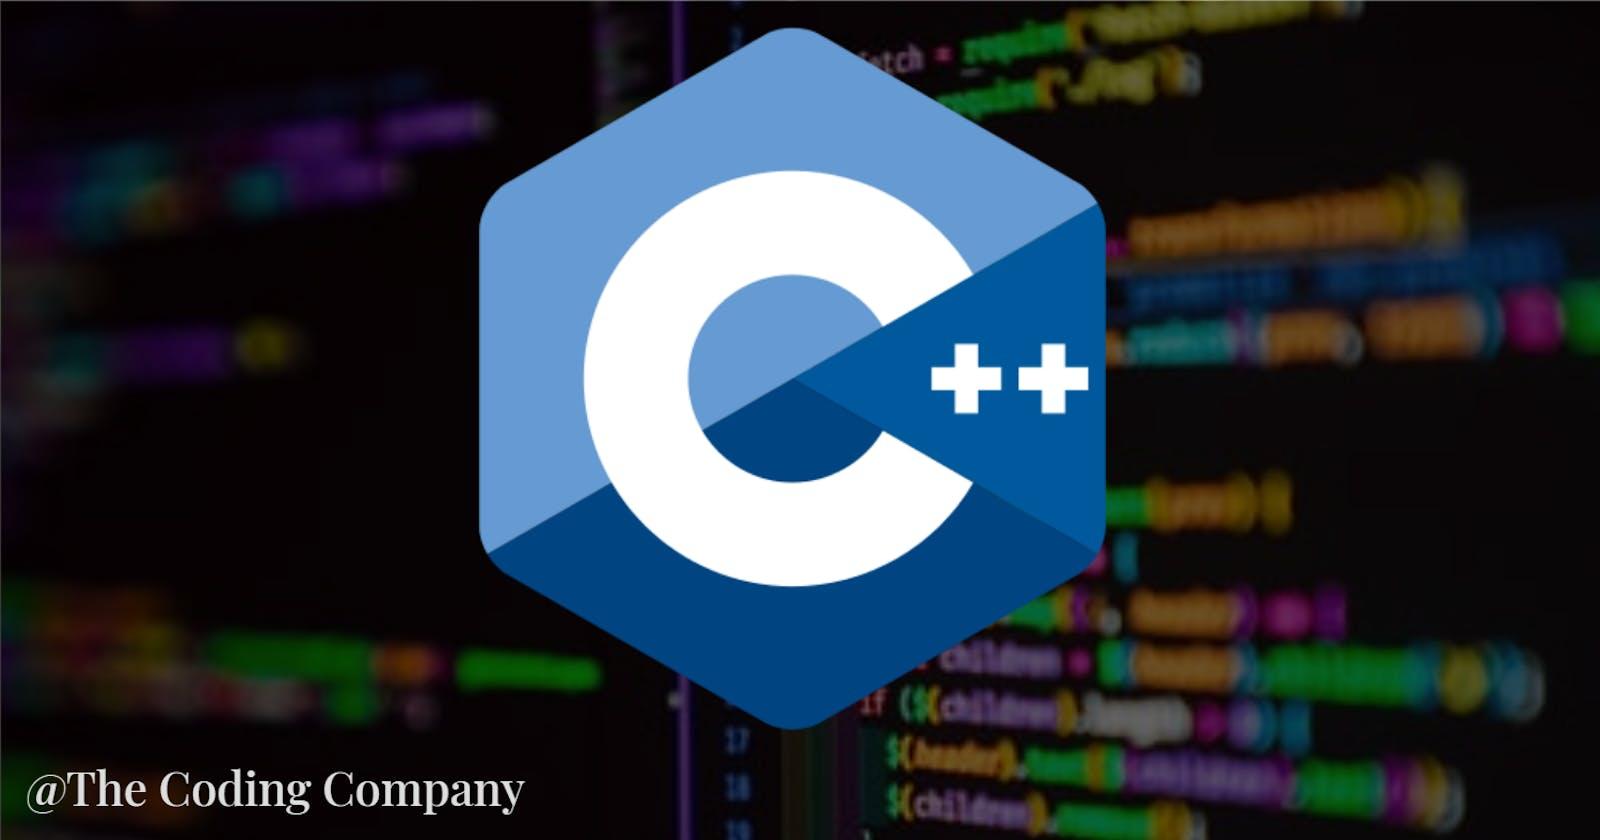 C++: Explain like I'm five – Part 2: Operators, User input, and if/else statements